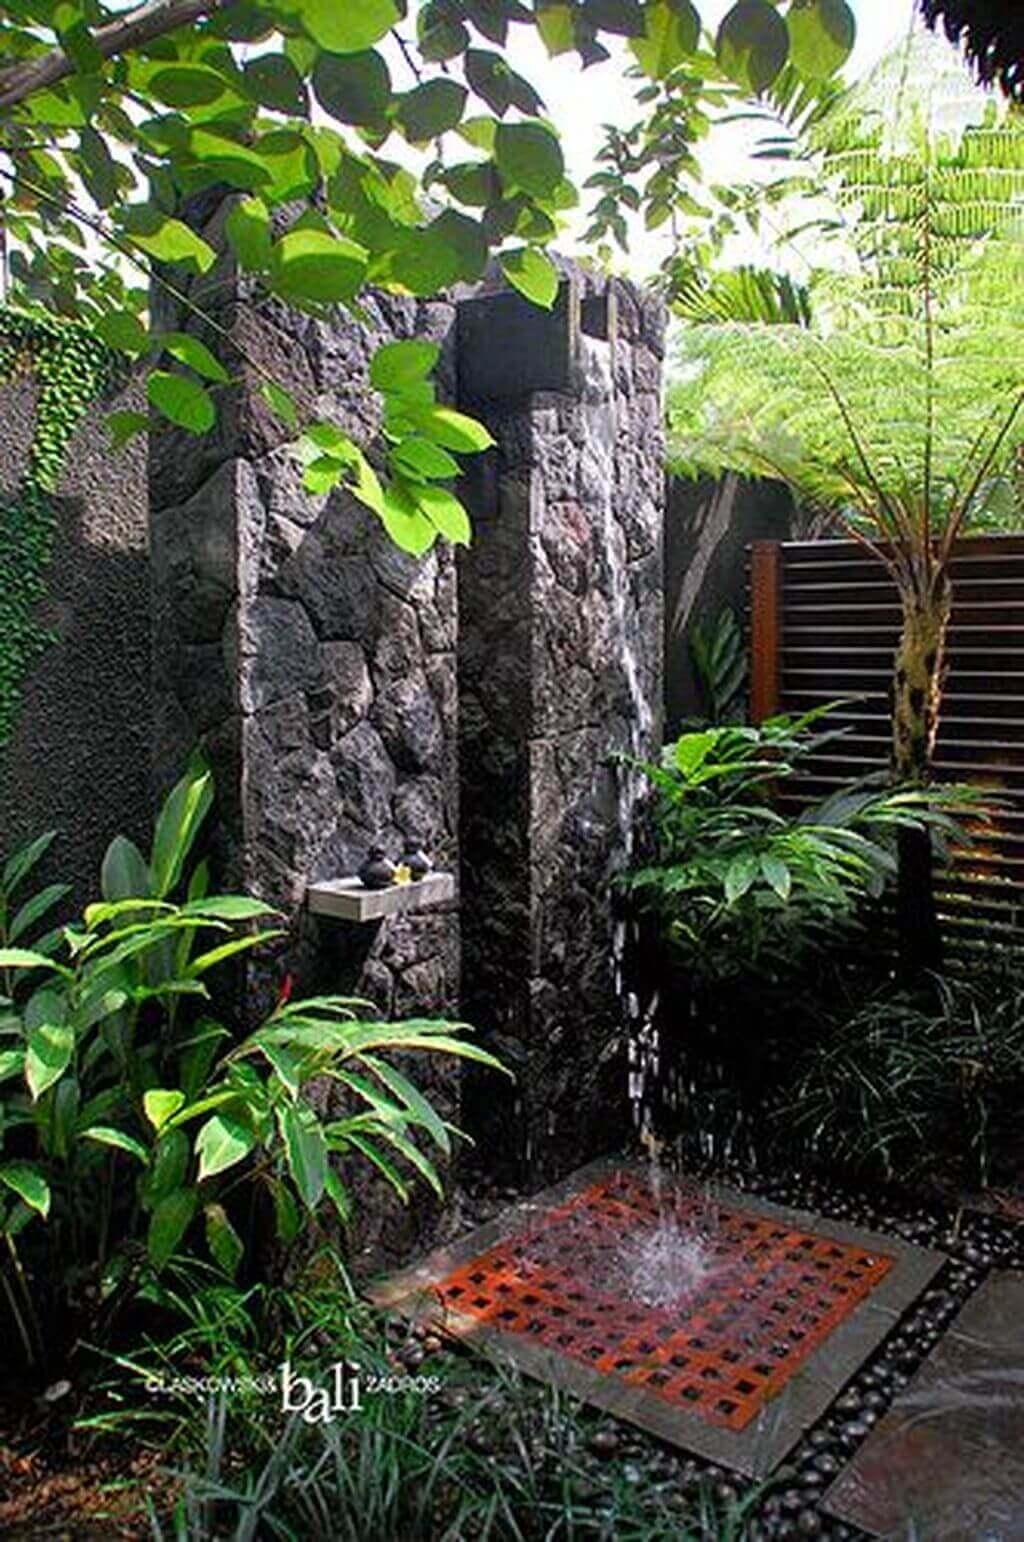 Outdoor Shower Ideas Garden in Bali - Harptimes.com